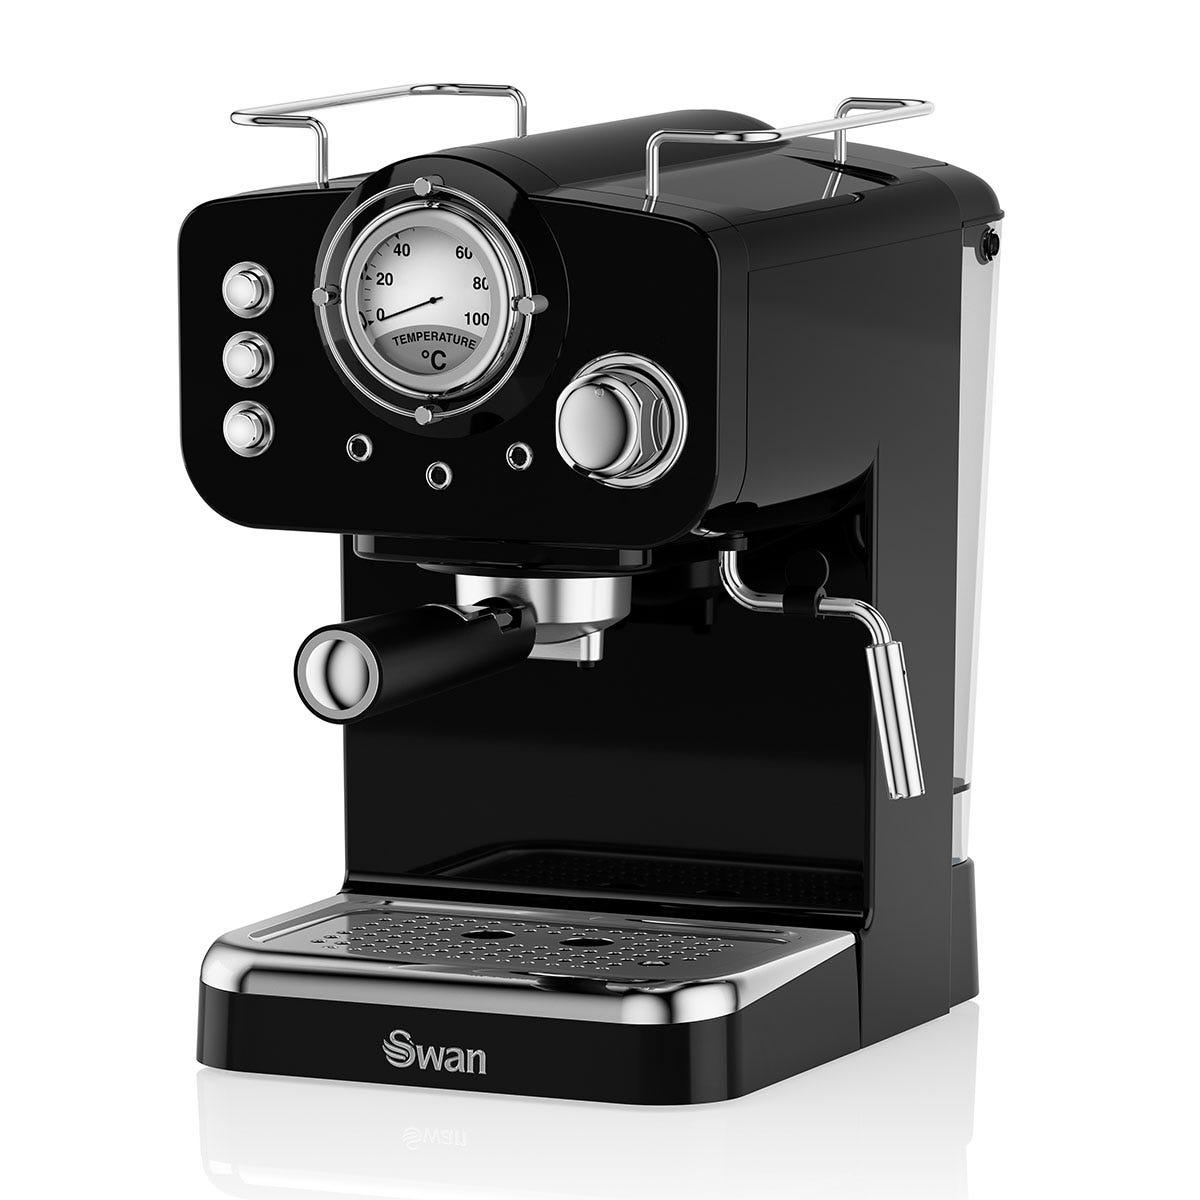 Swan SK22110BN Retro Pump 1100W Espresso Coffee Machine - Black